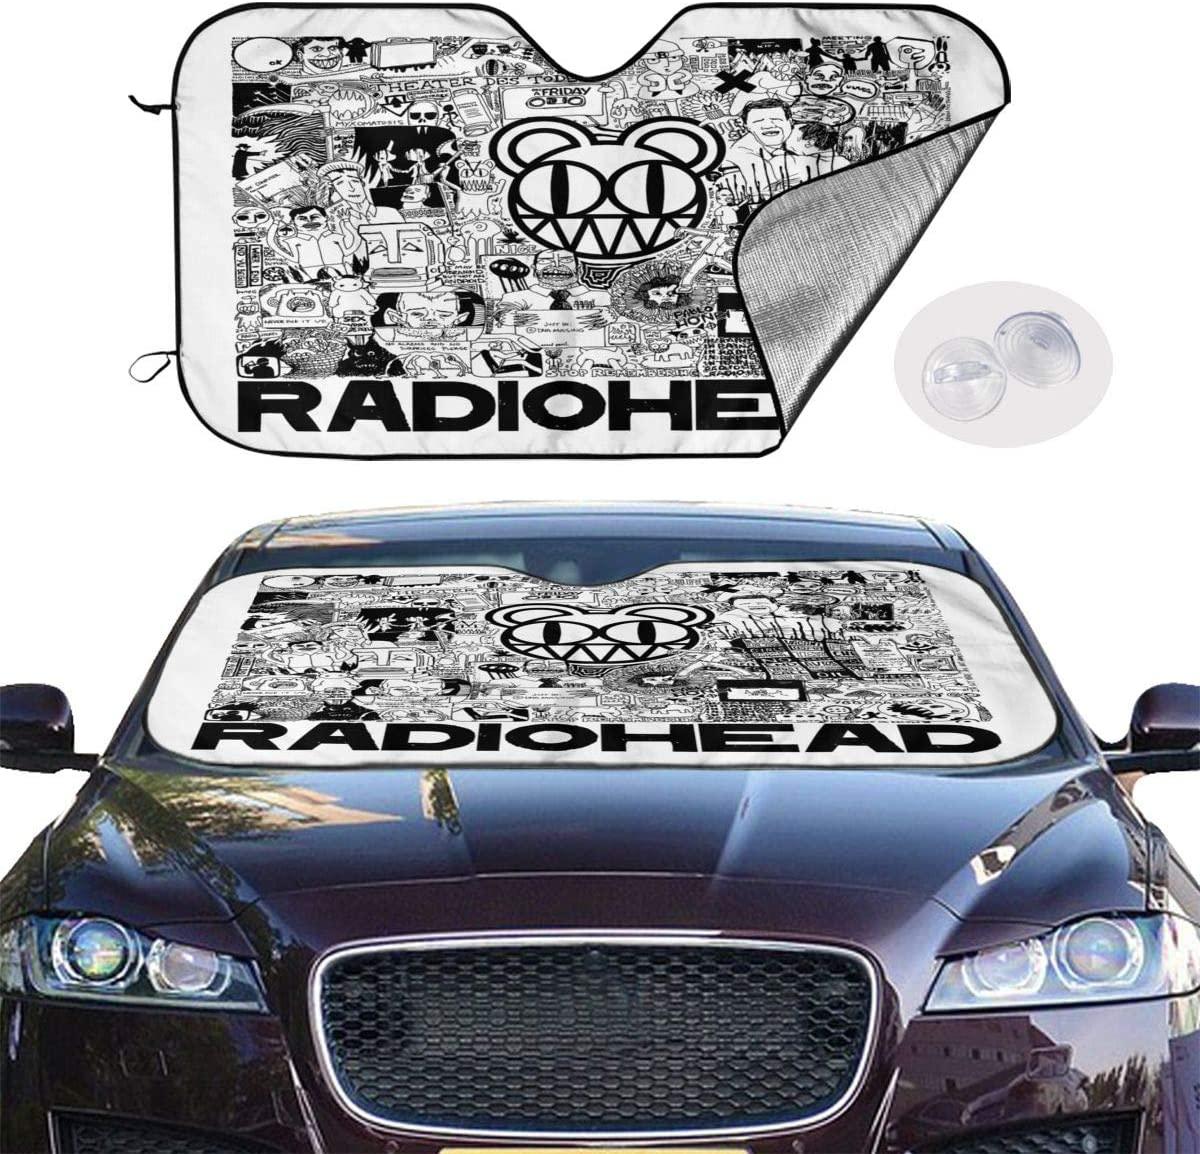 NOT Radiohead Universal and Stylish Car Windshield Visor